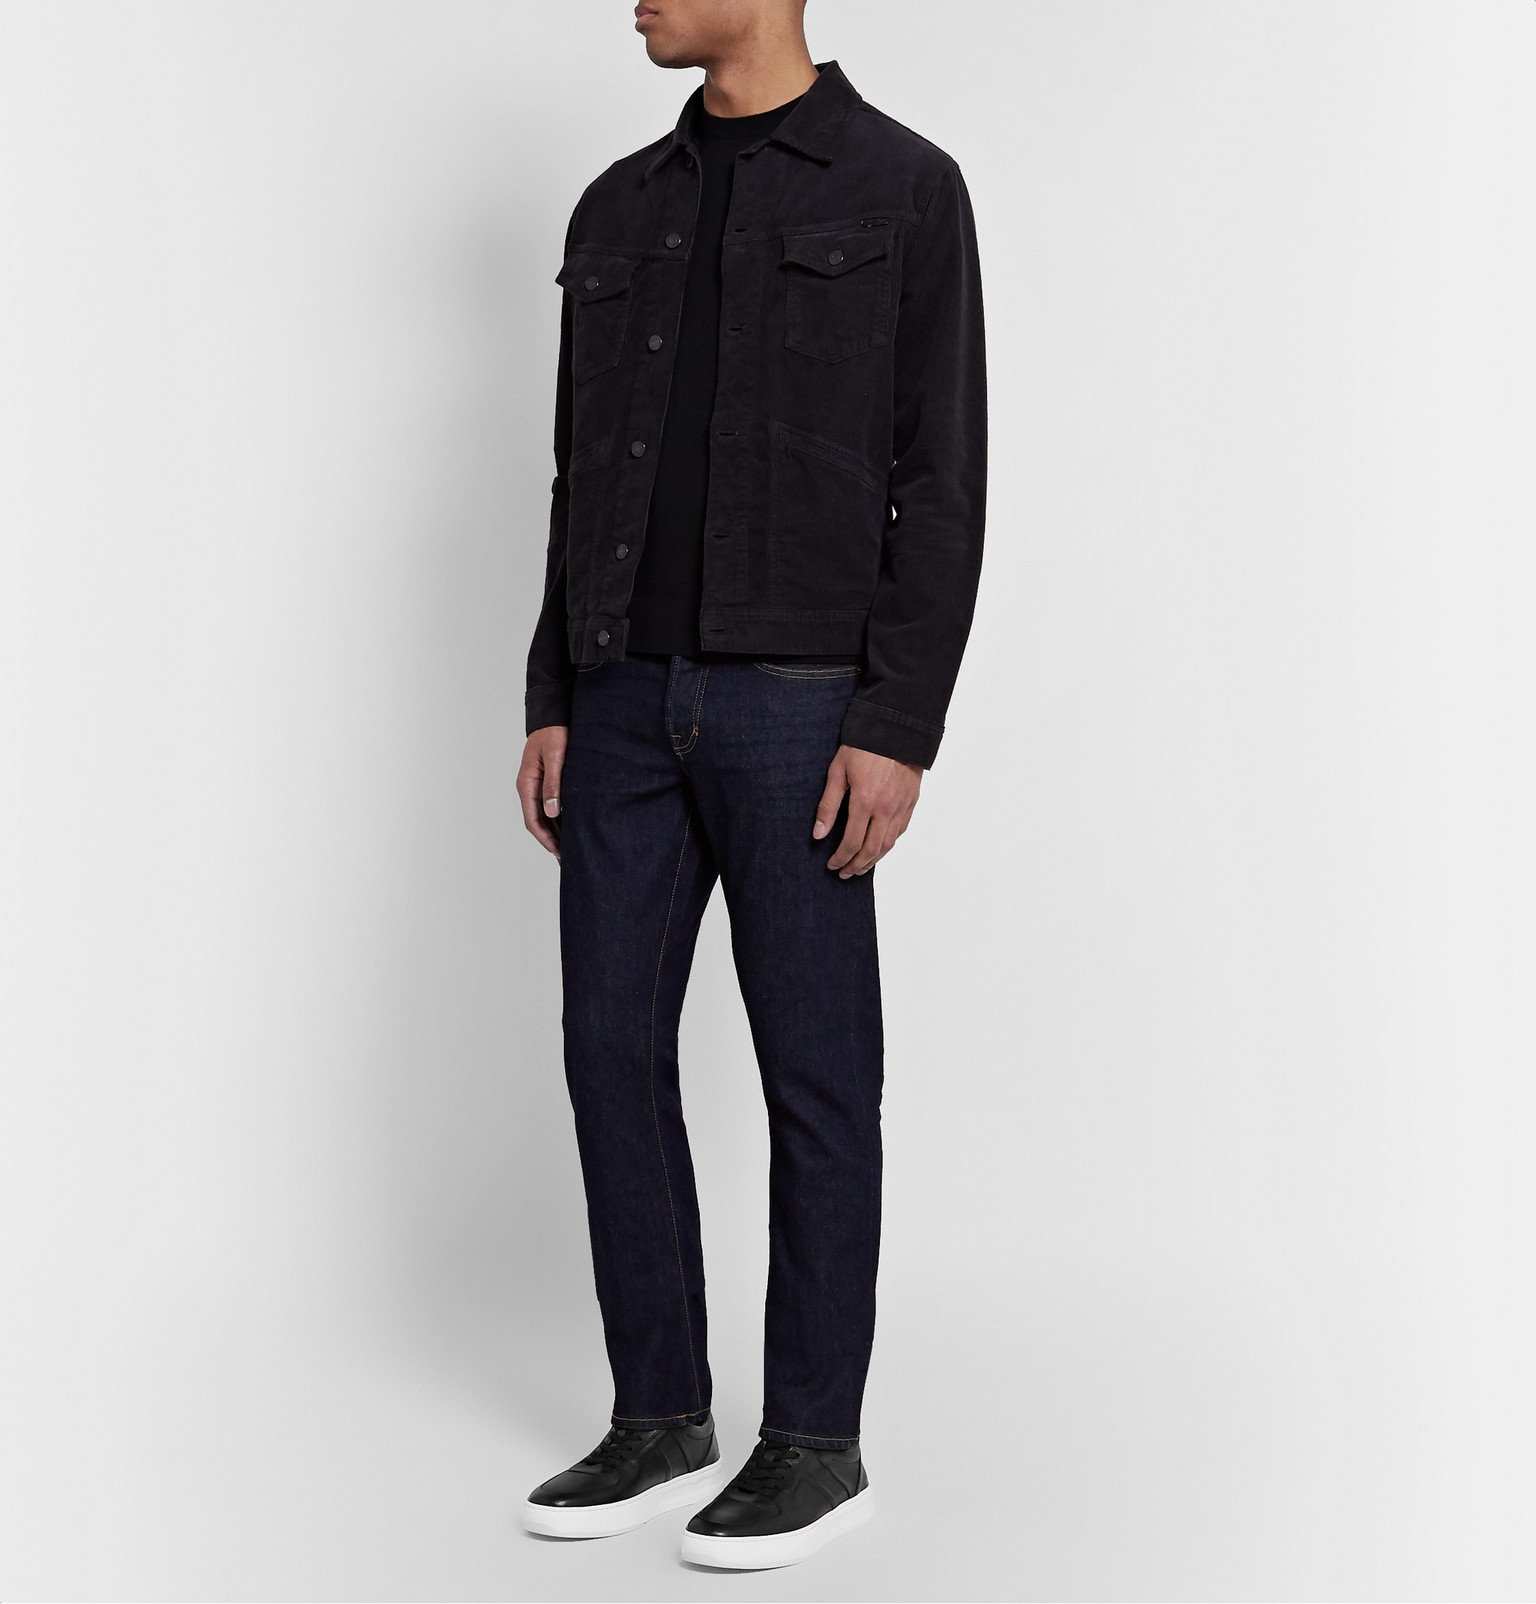 Tod's - Full-Grain Leather Sneakers - Black